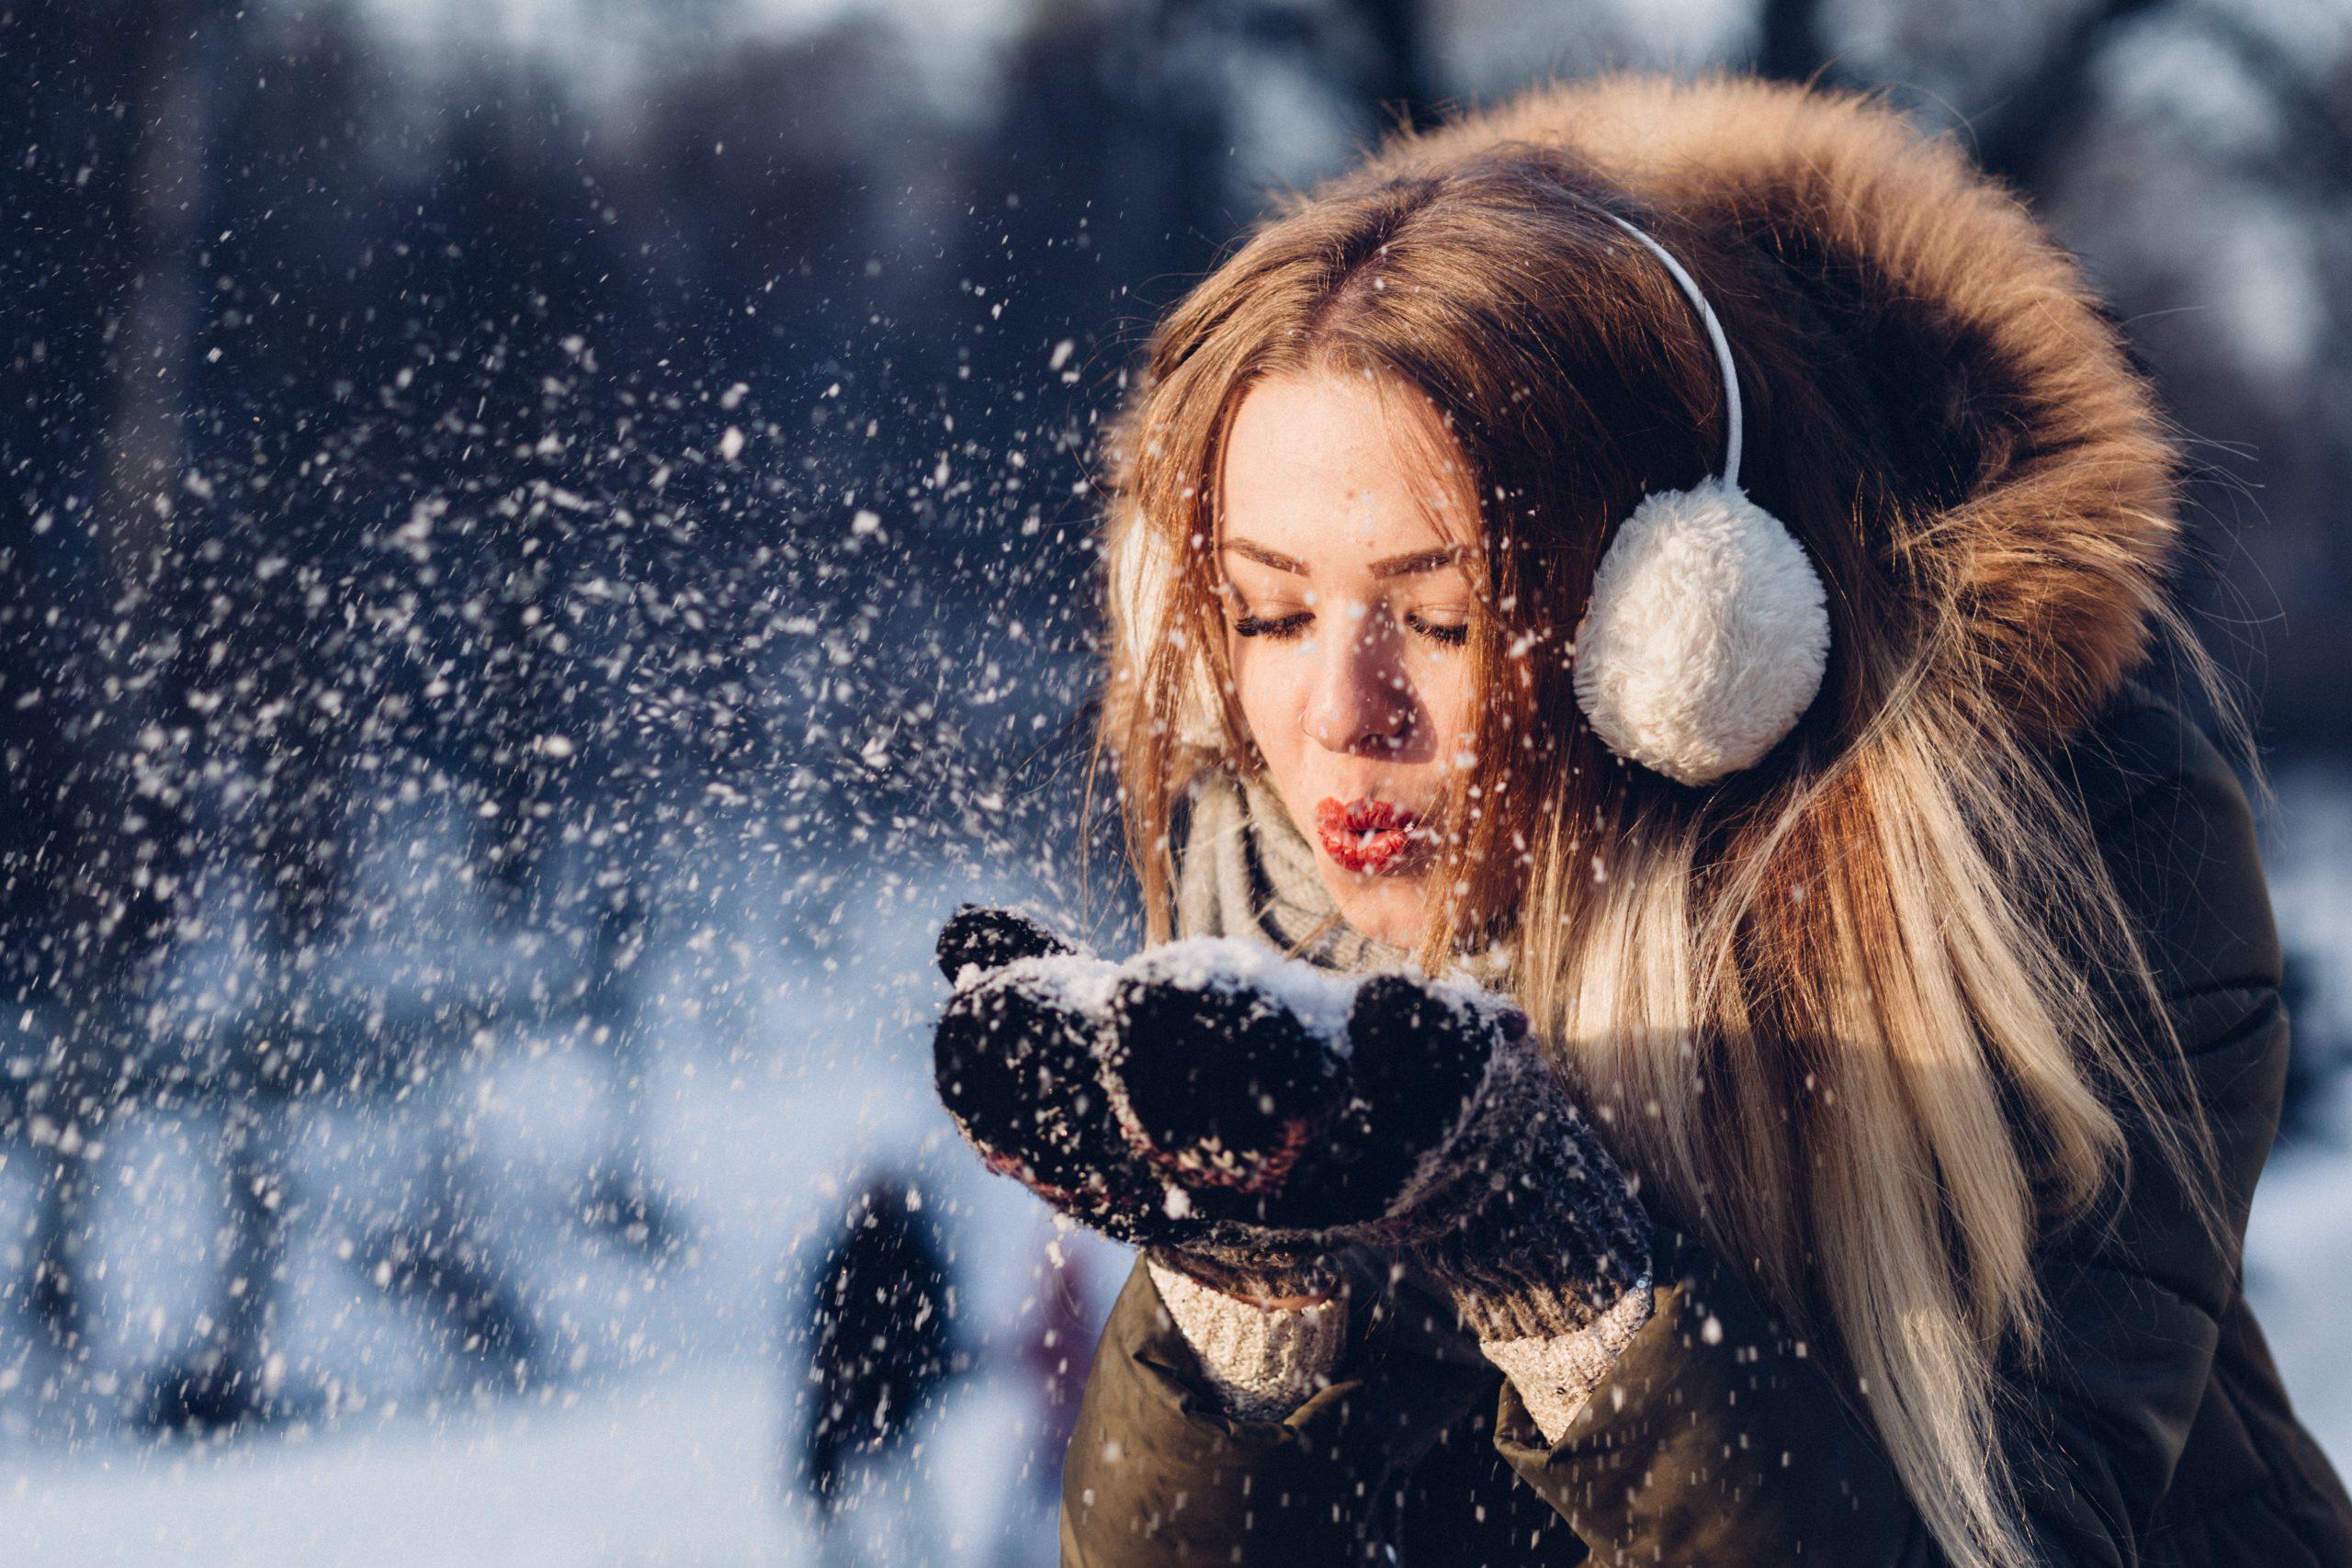 modne inspiracje - uroda zimą